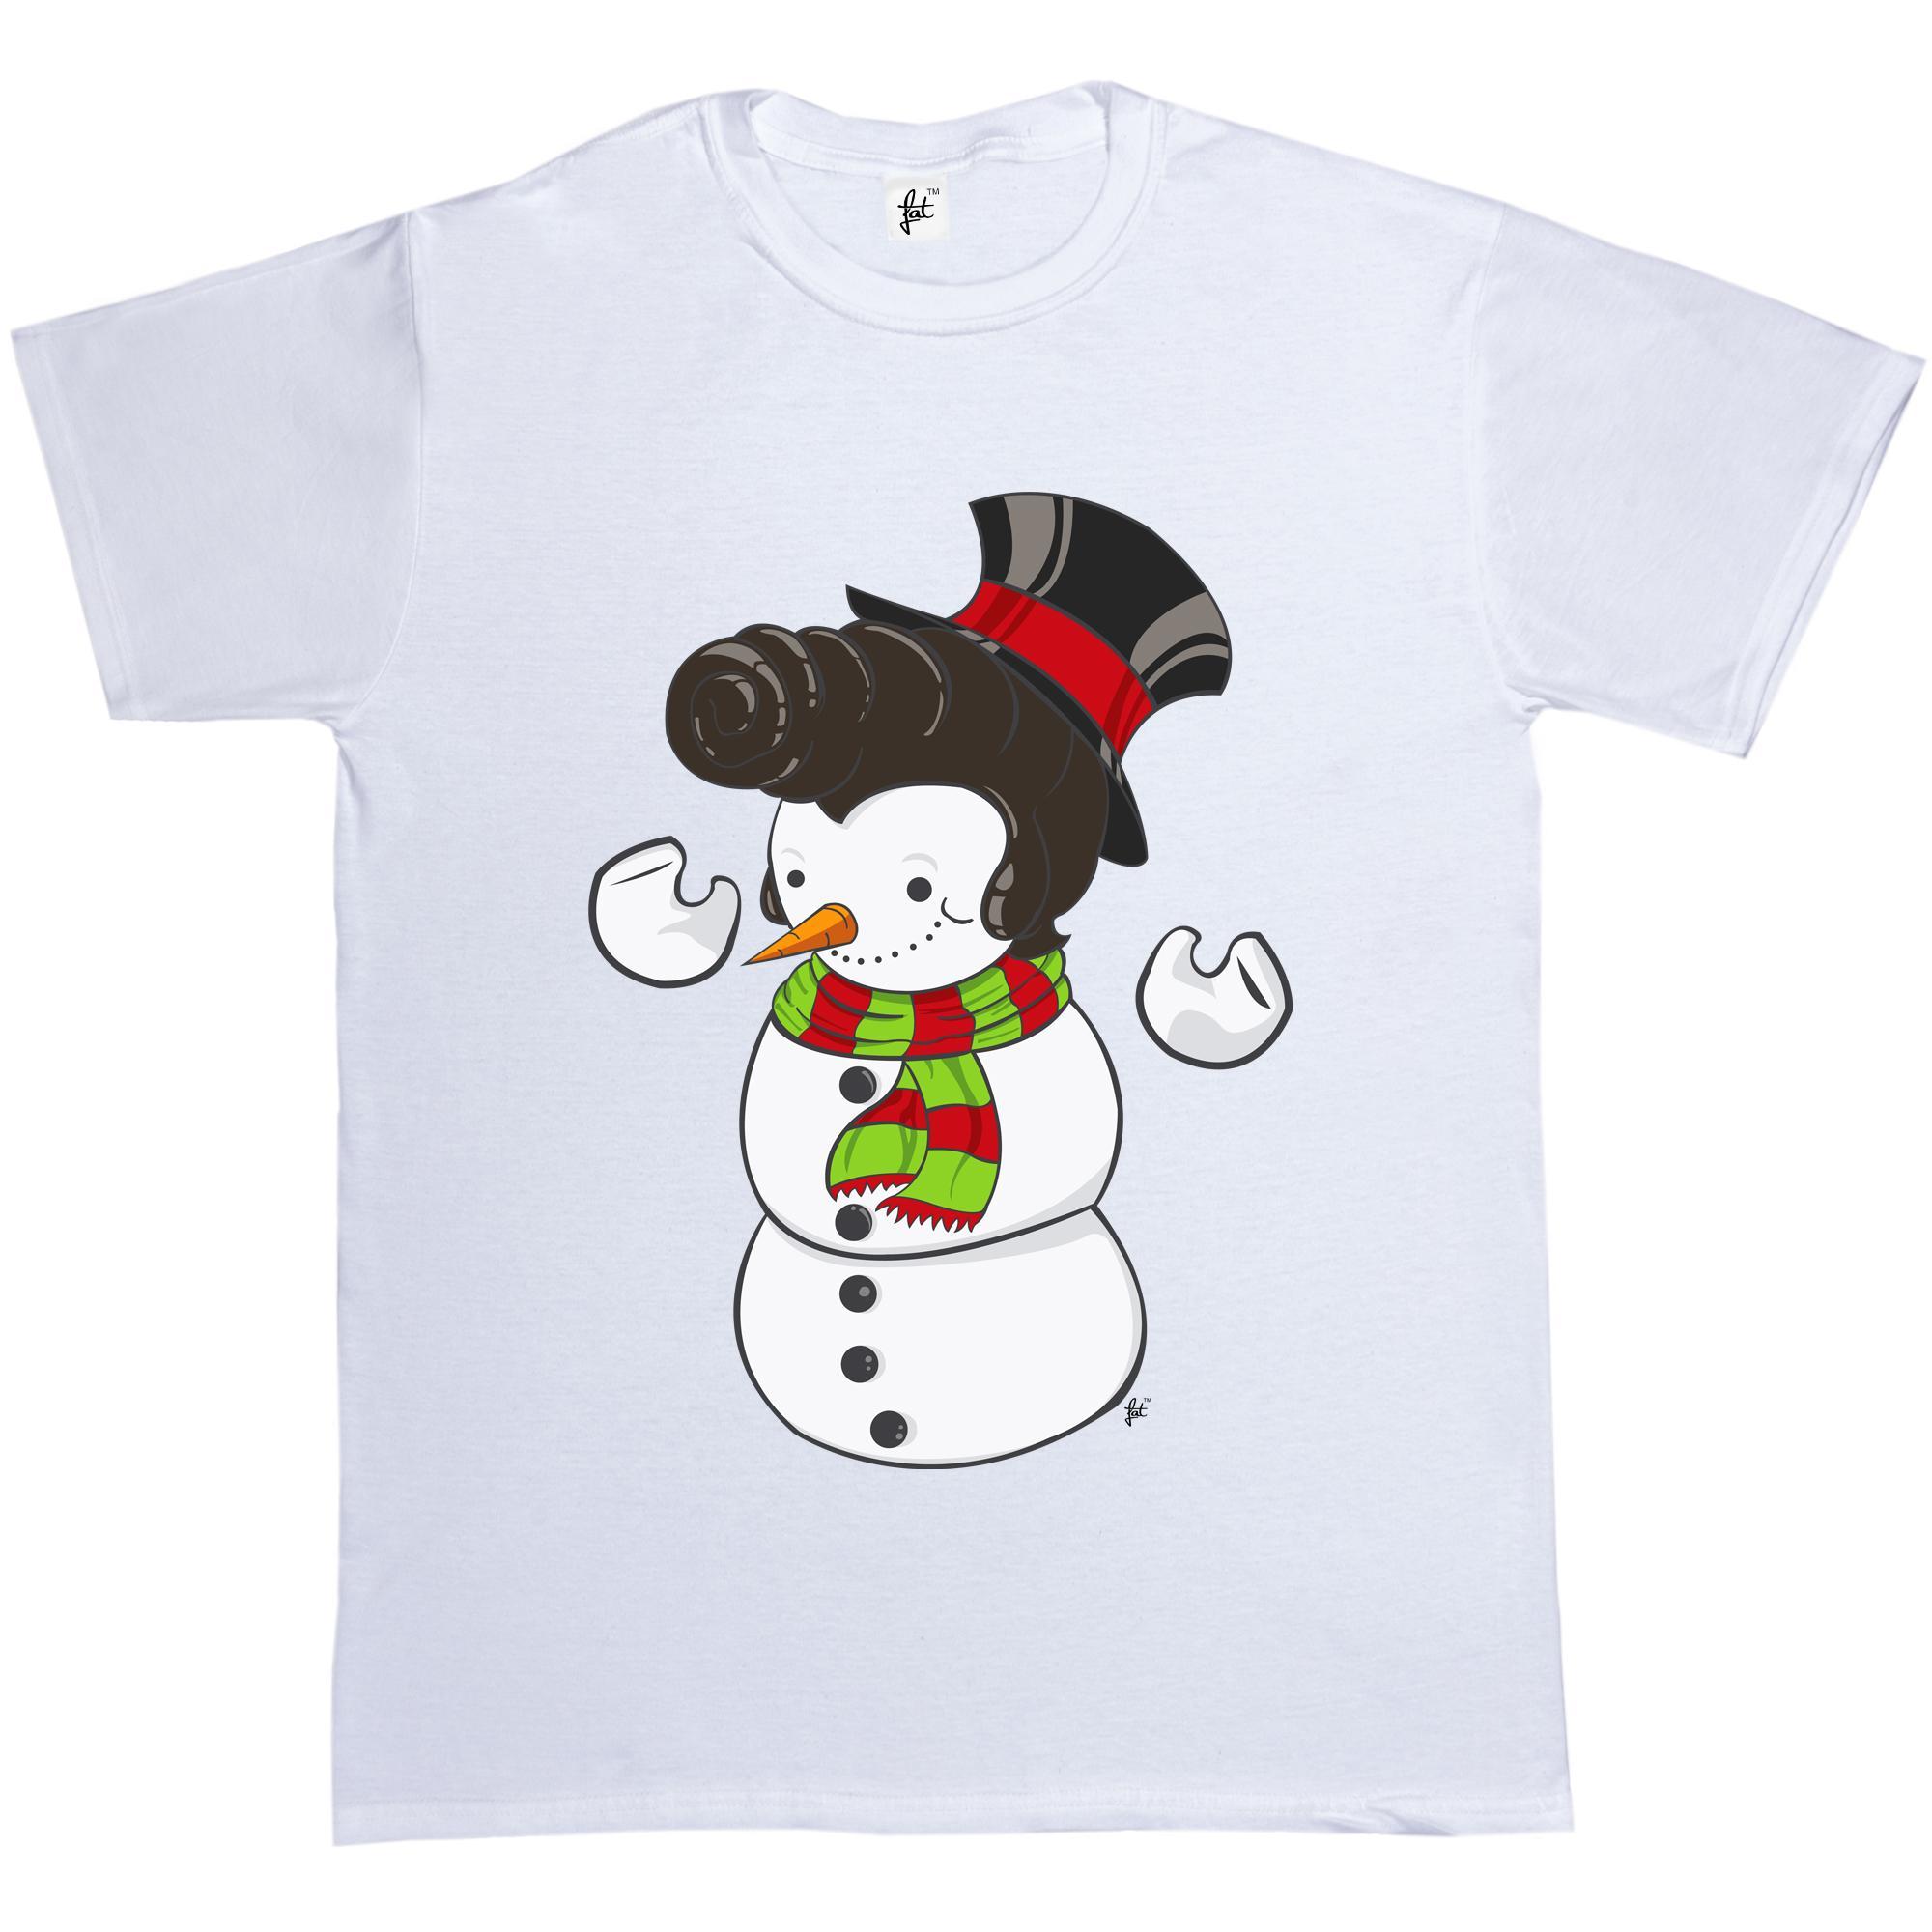 Elvis Presley Christmas Music.Snowman With Elvis Presley Type Quiff Hair Smiling Christmas Music Mens T Shirt Summer Short Sleeves New Fashion T Shirt